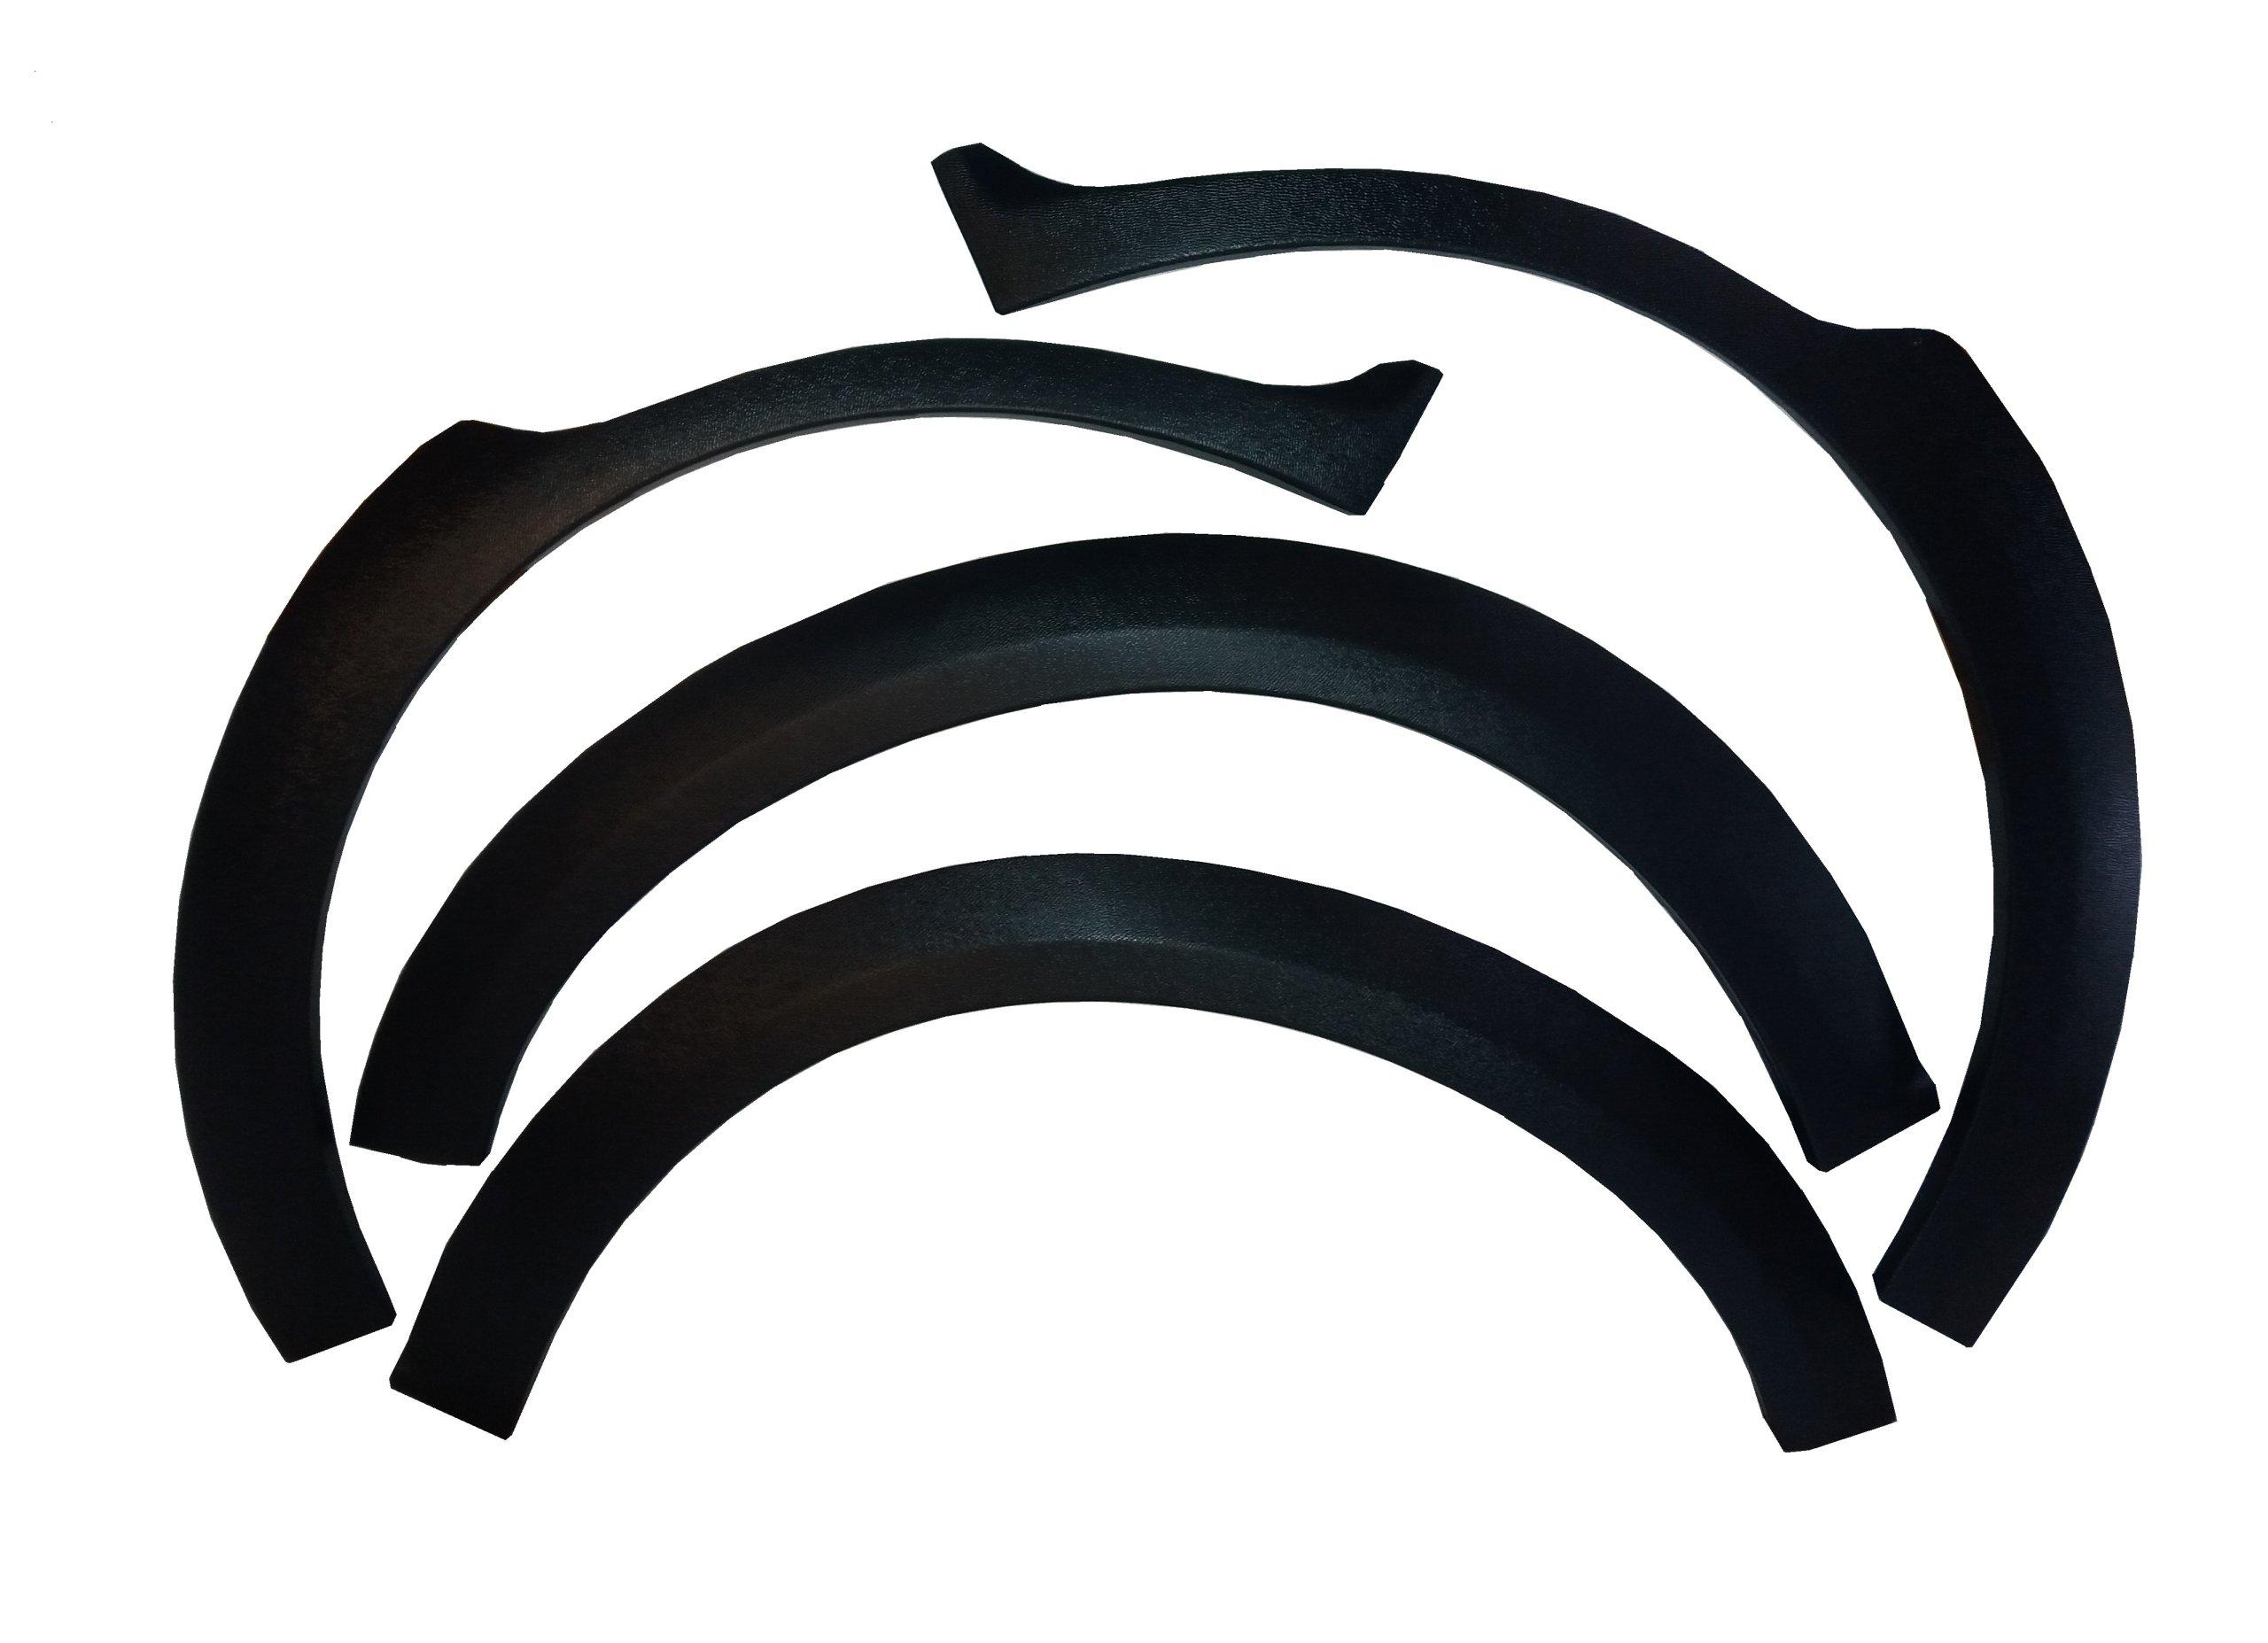 накладки крыло крыльев hyundai getz 5d